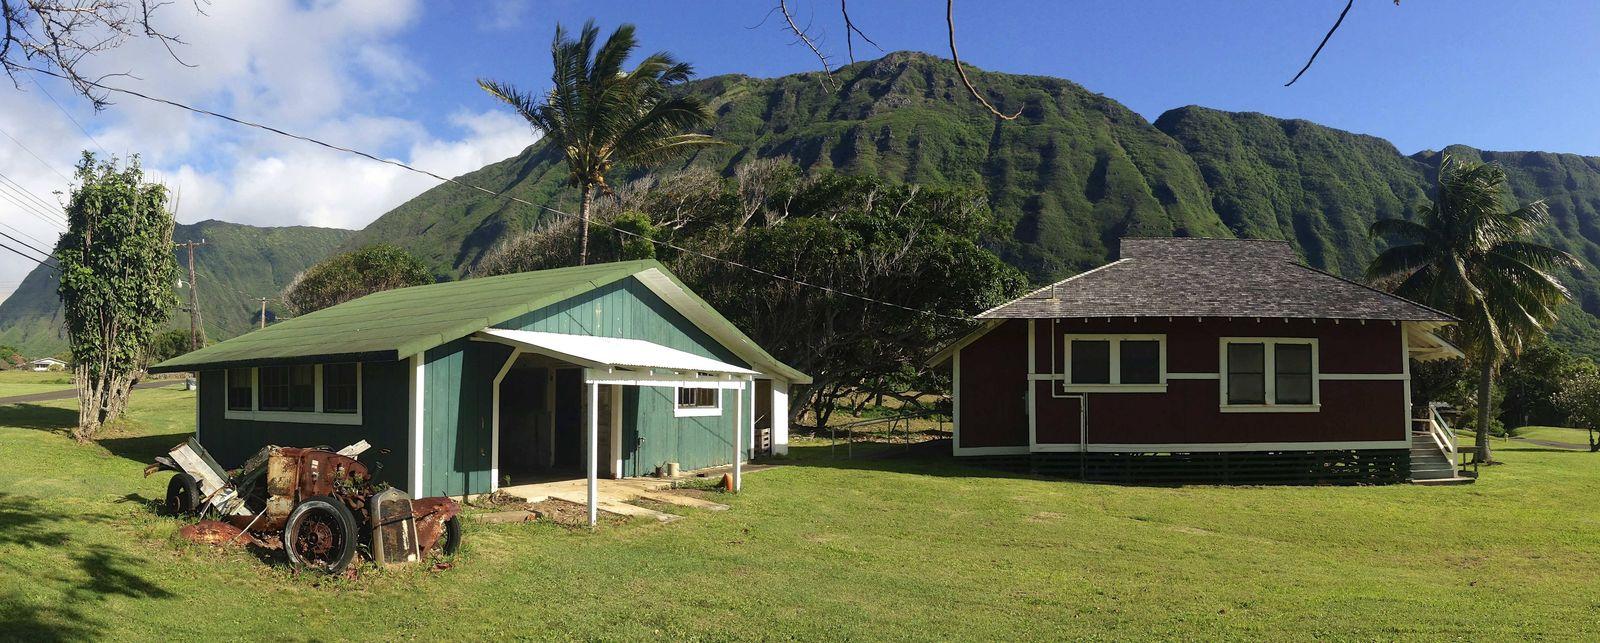 Oct 18 2015 Kalaupapa United States of America Kenso Seki House typical of Hawaiian Plantati